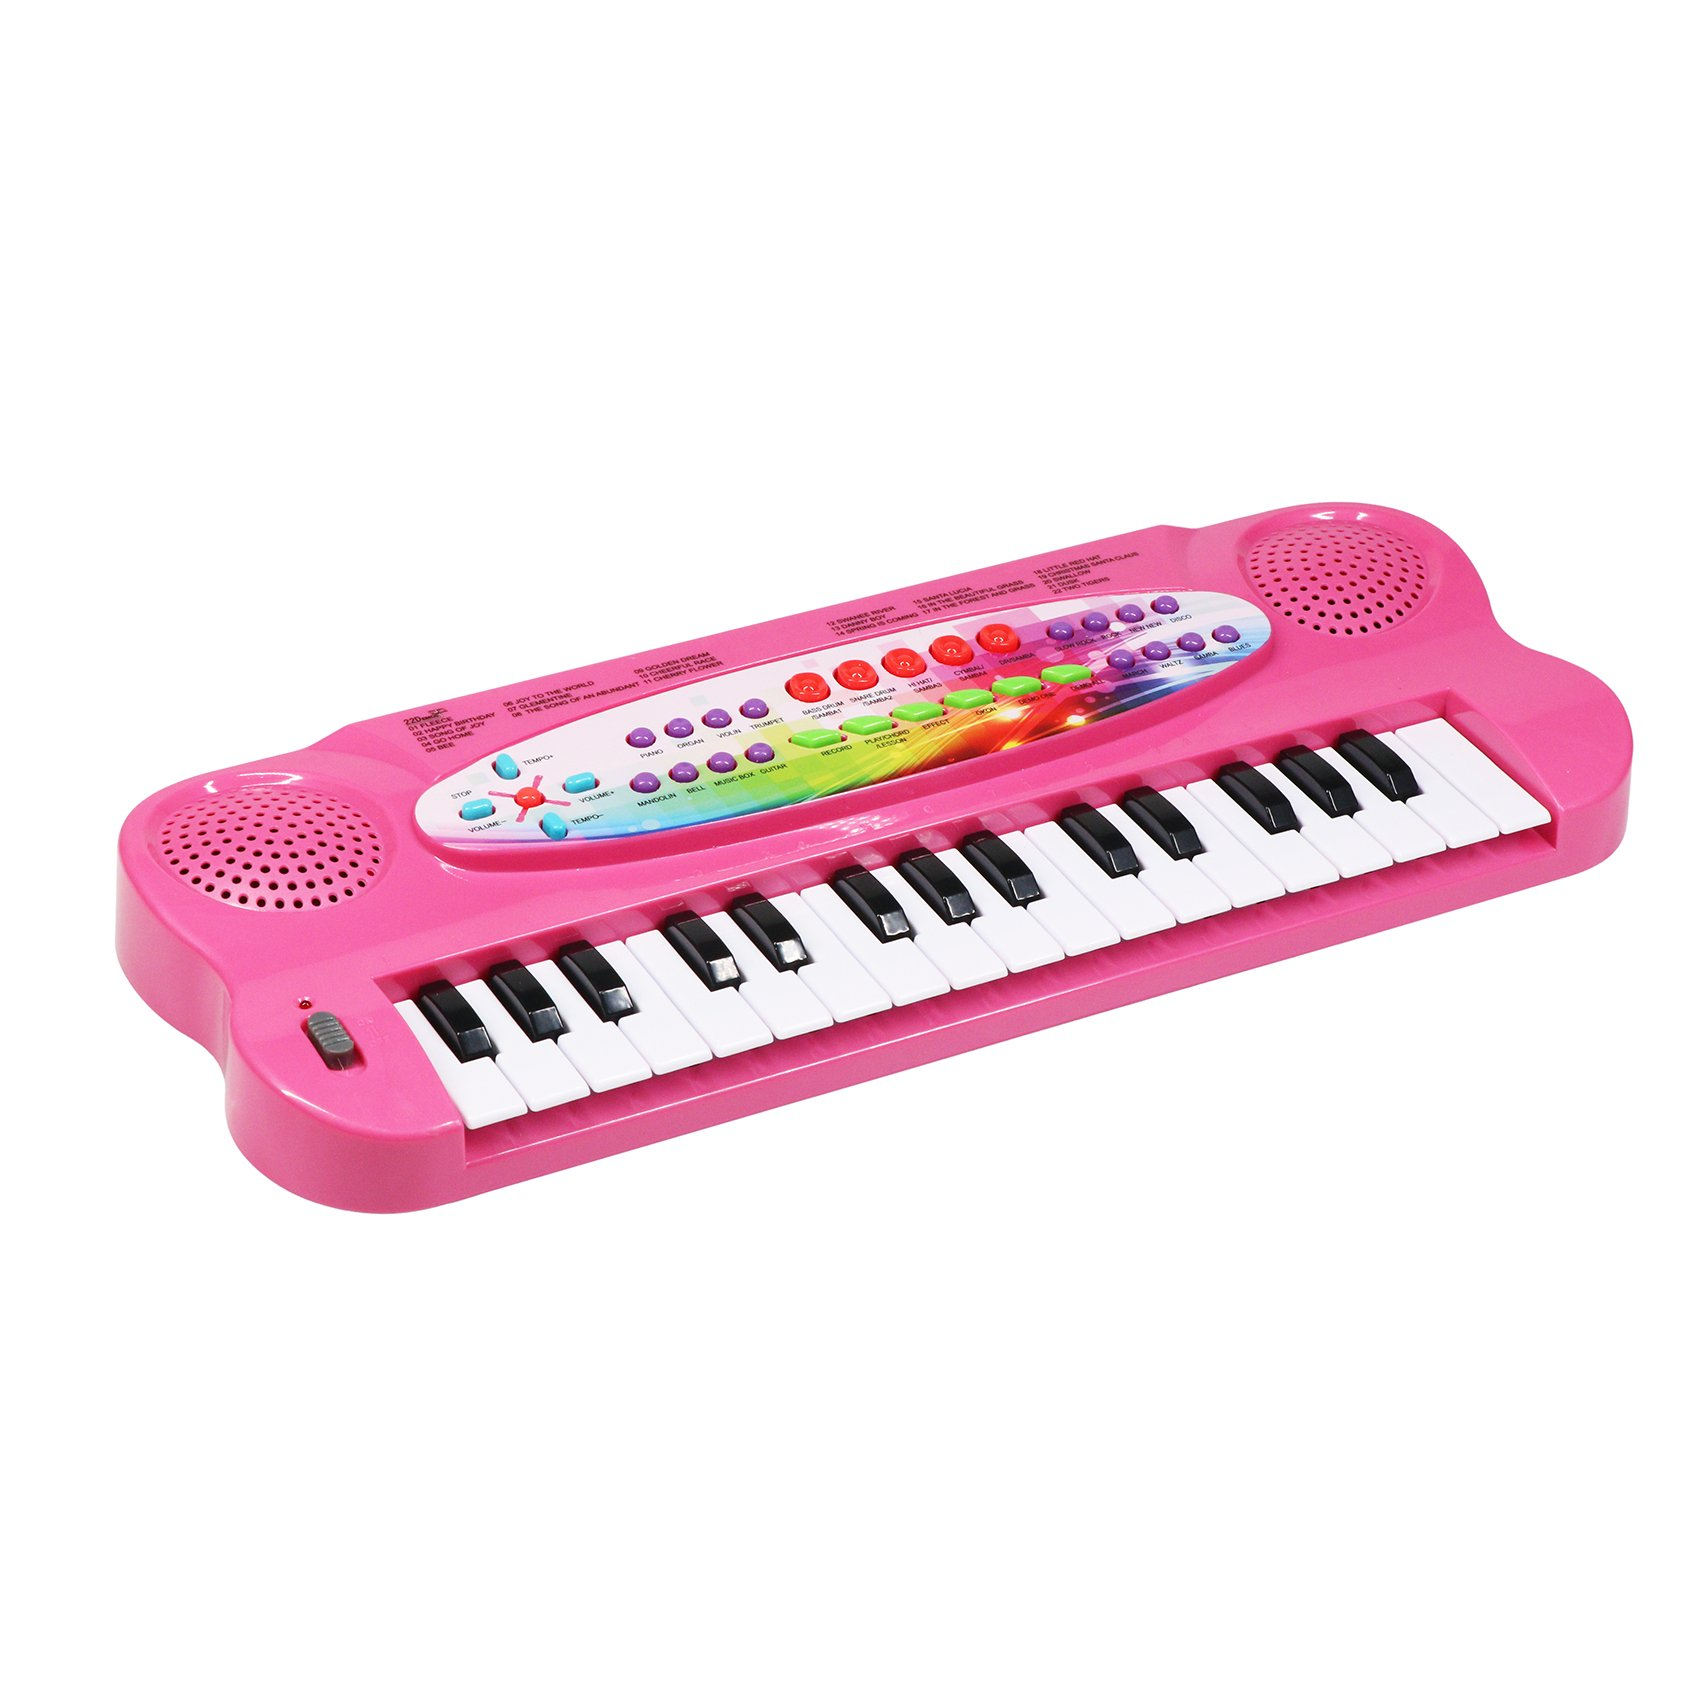 aPerfectLife Kids Piano, 32 Keys Multifunction Electronic Kids Piano Keyboard Musial Instrument Kids Microphone (Pink)